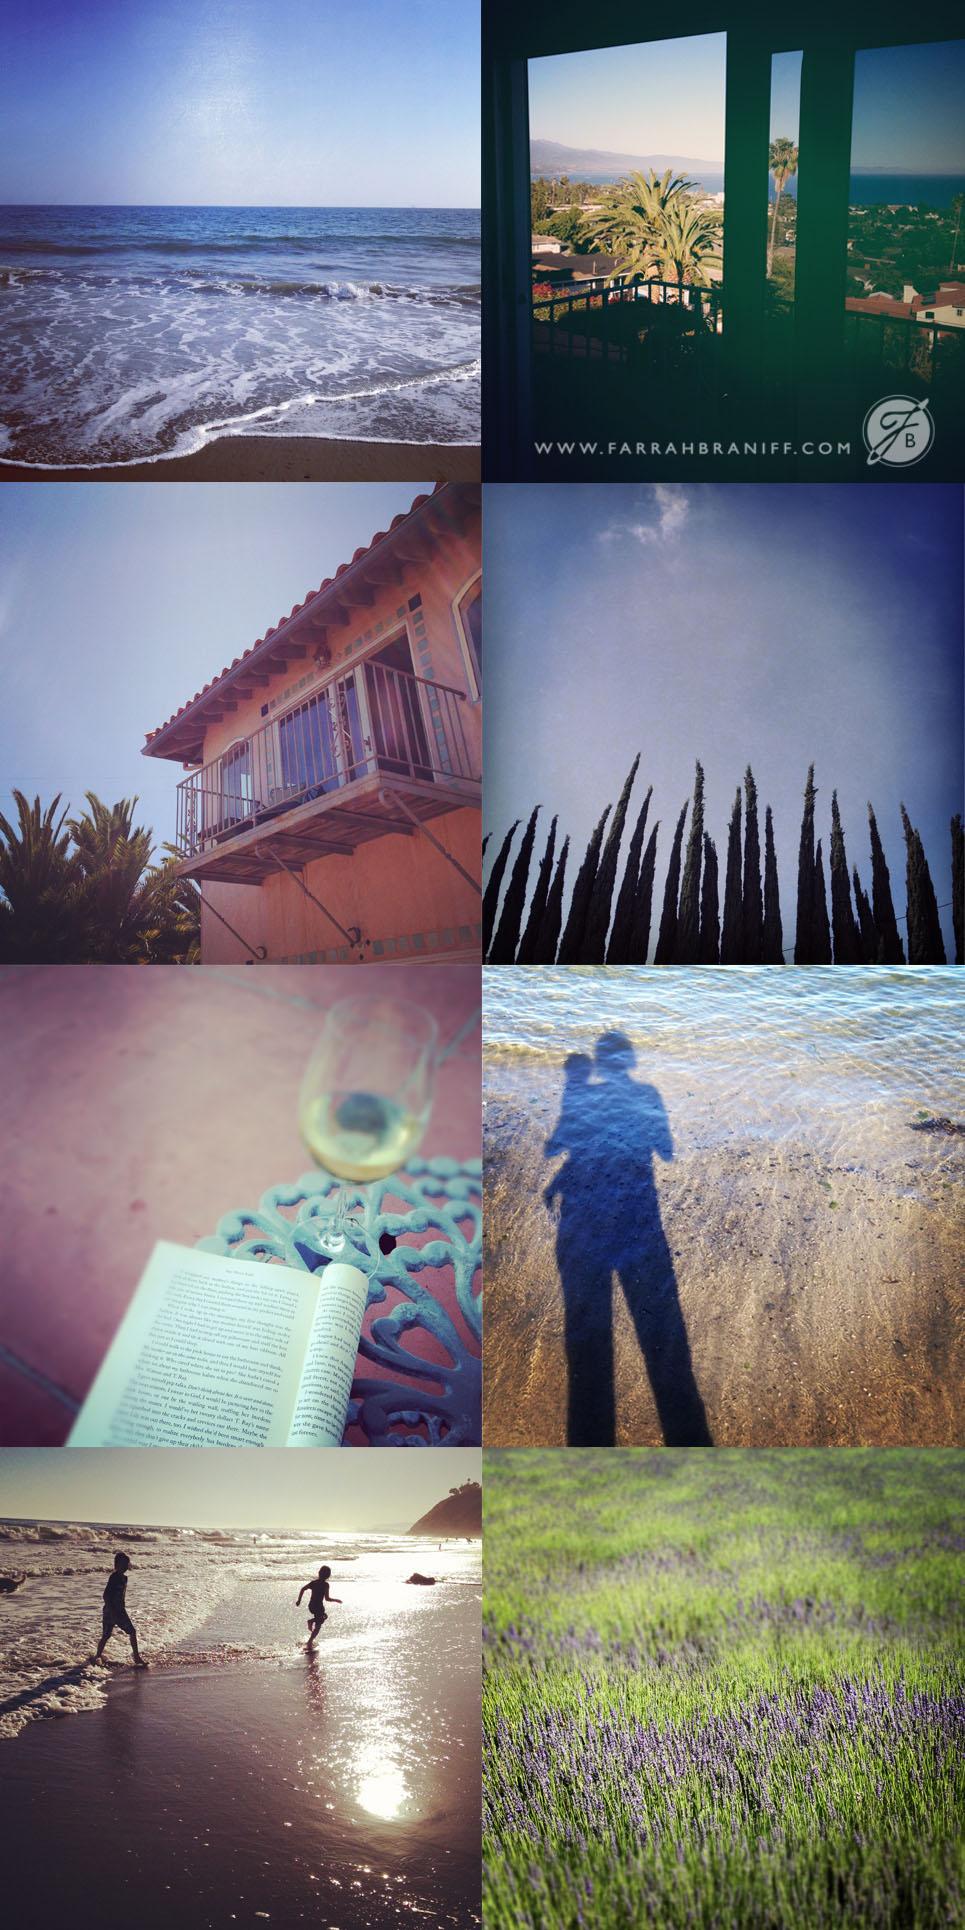 SB_2012_IG_collage.jpg